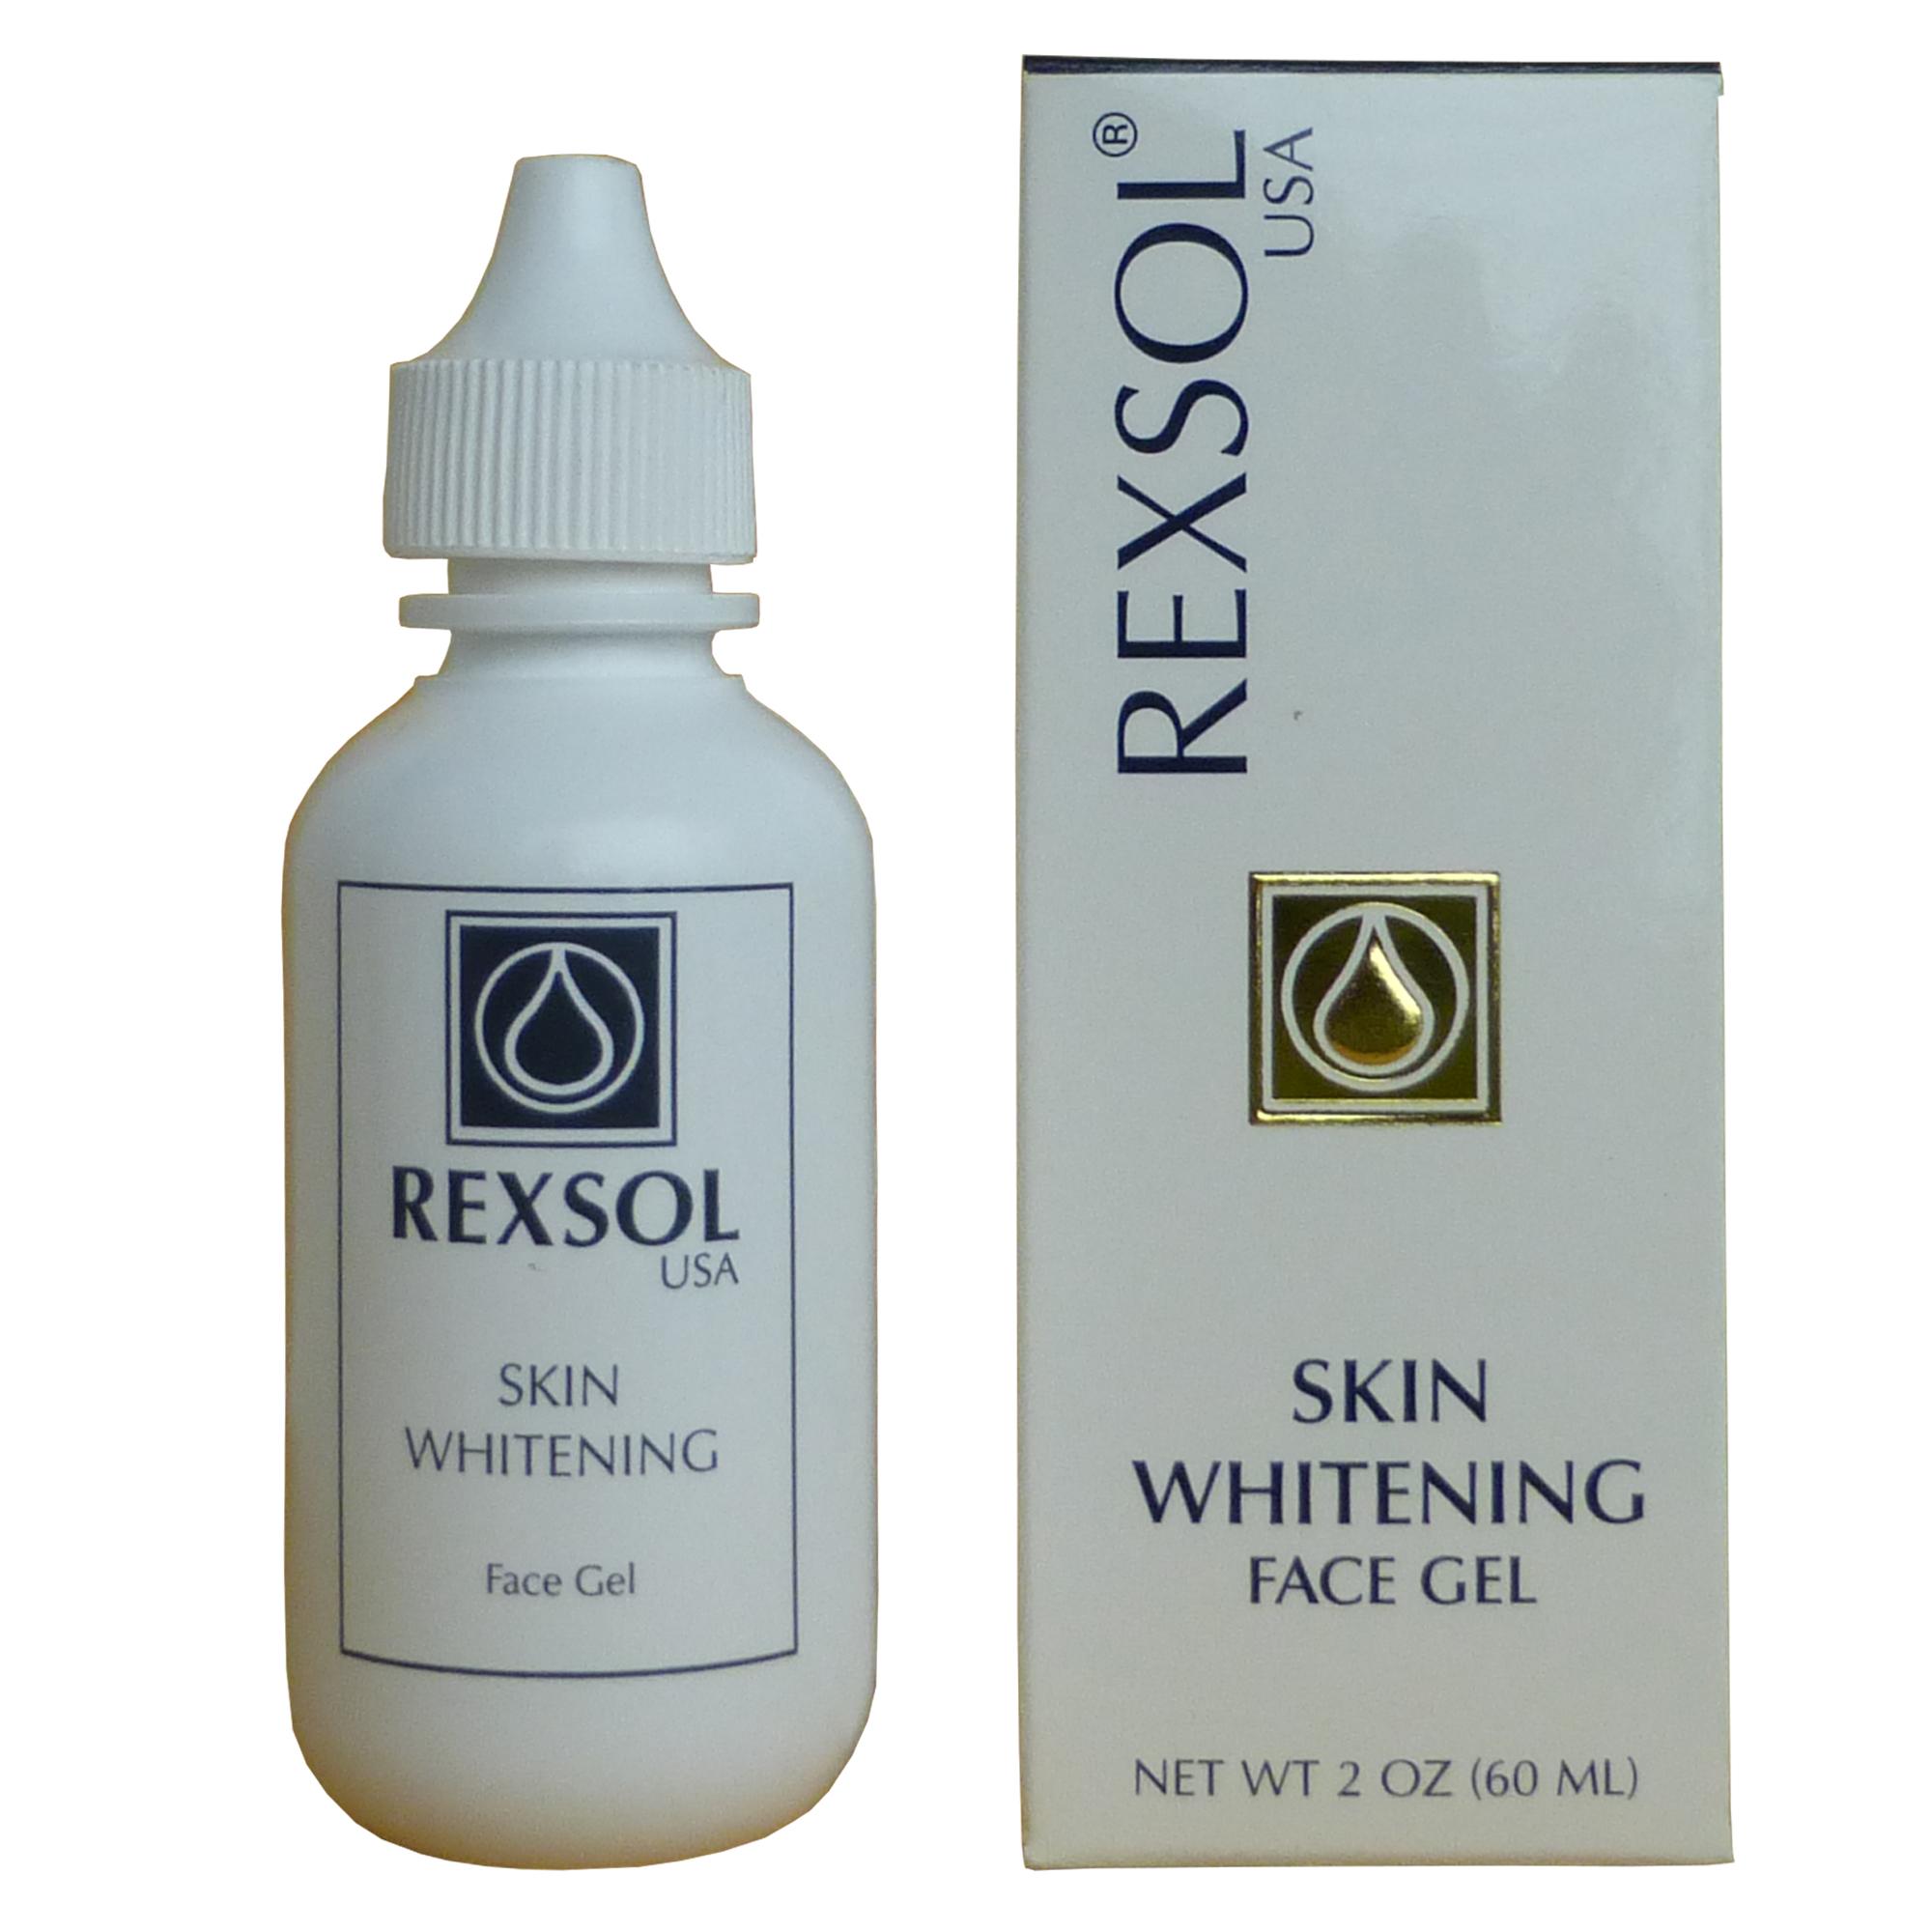 skin whitening gel - with--